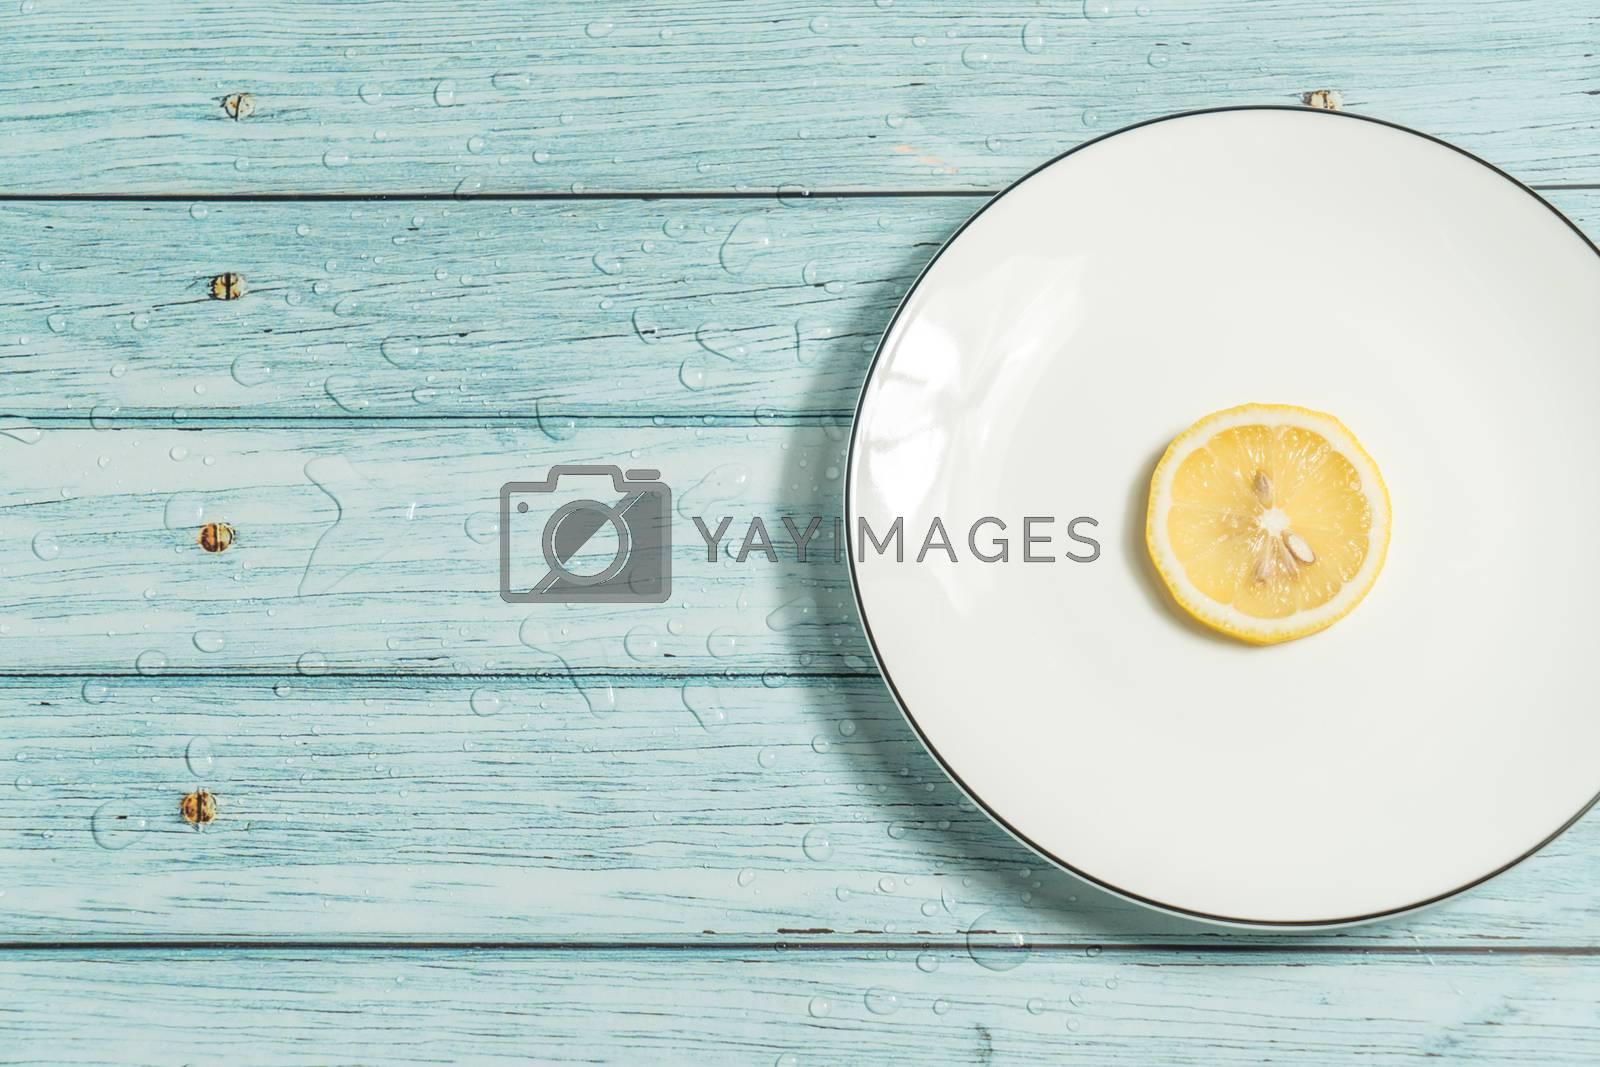 the fruit lemon on the blue table, cool light background by vinkfan